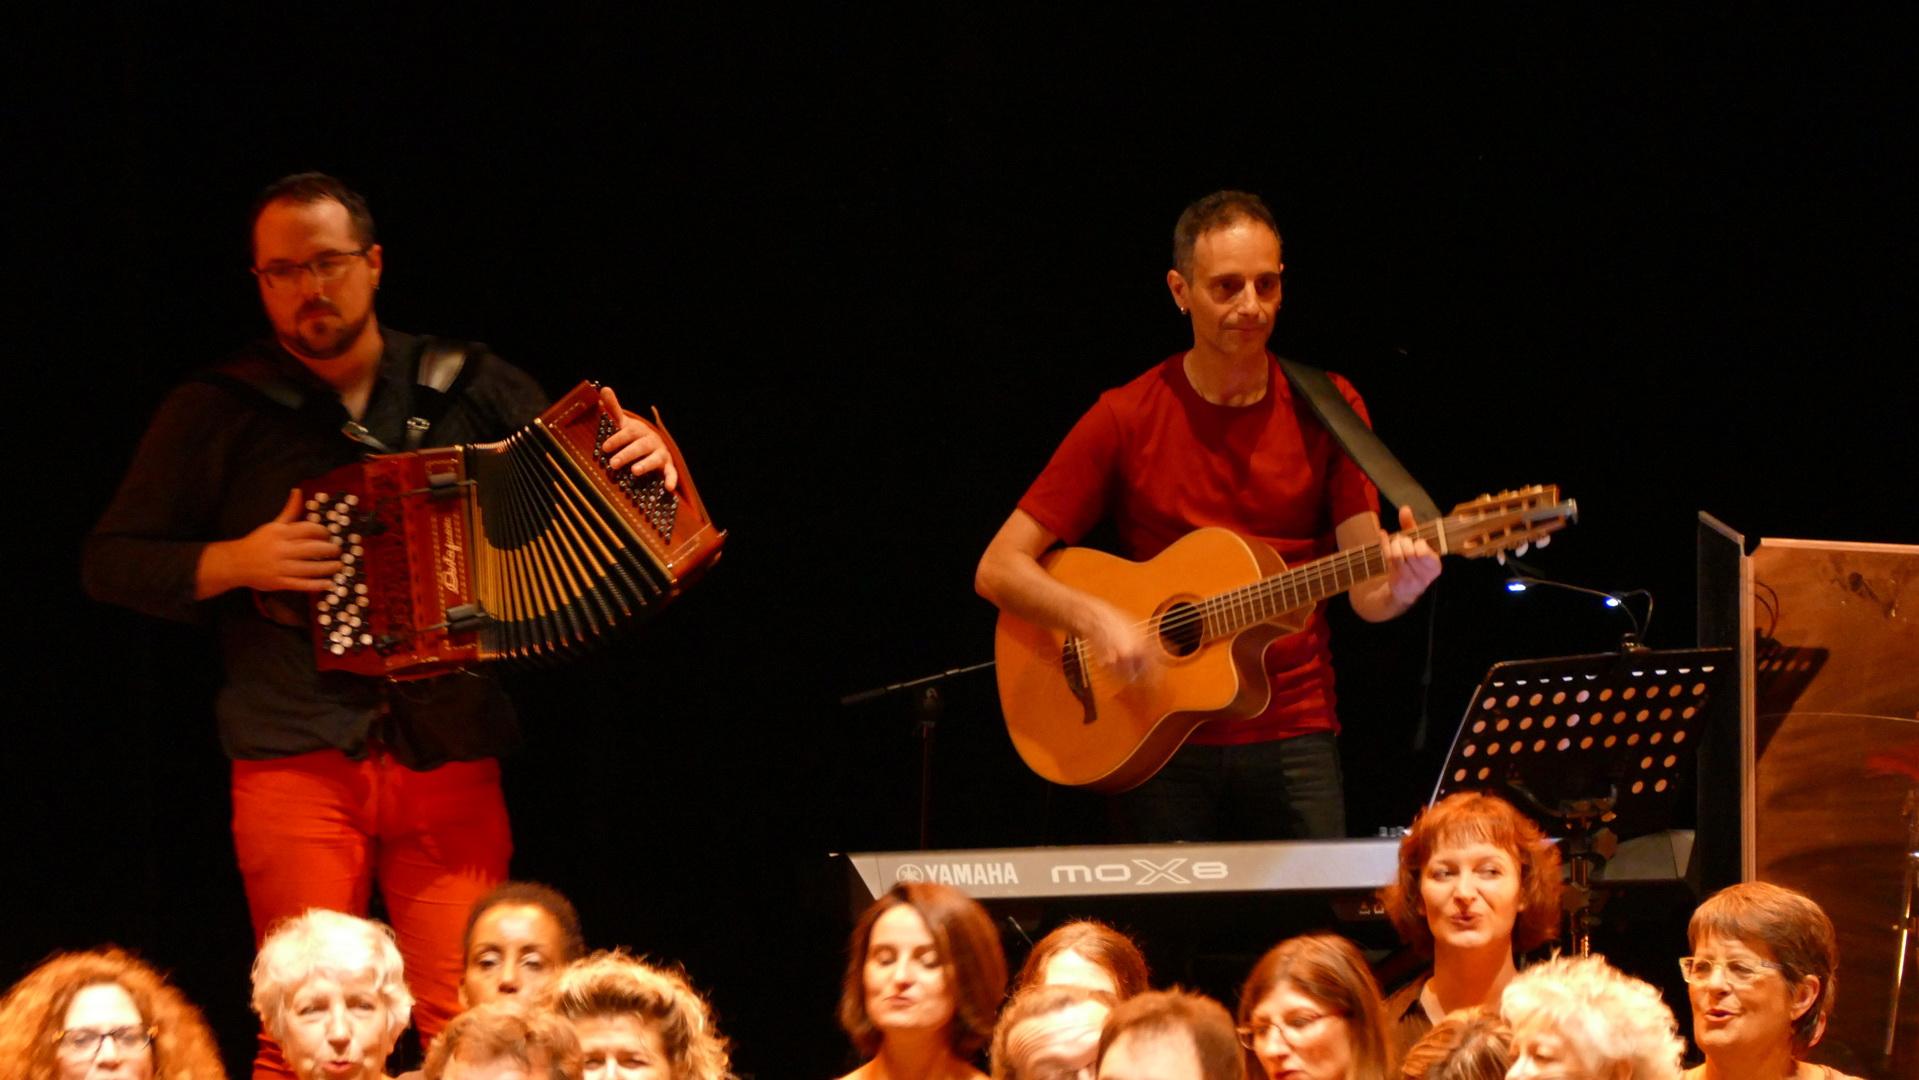 LFDS_concert_ailleurs (77)